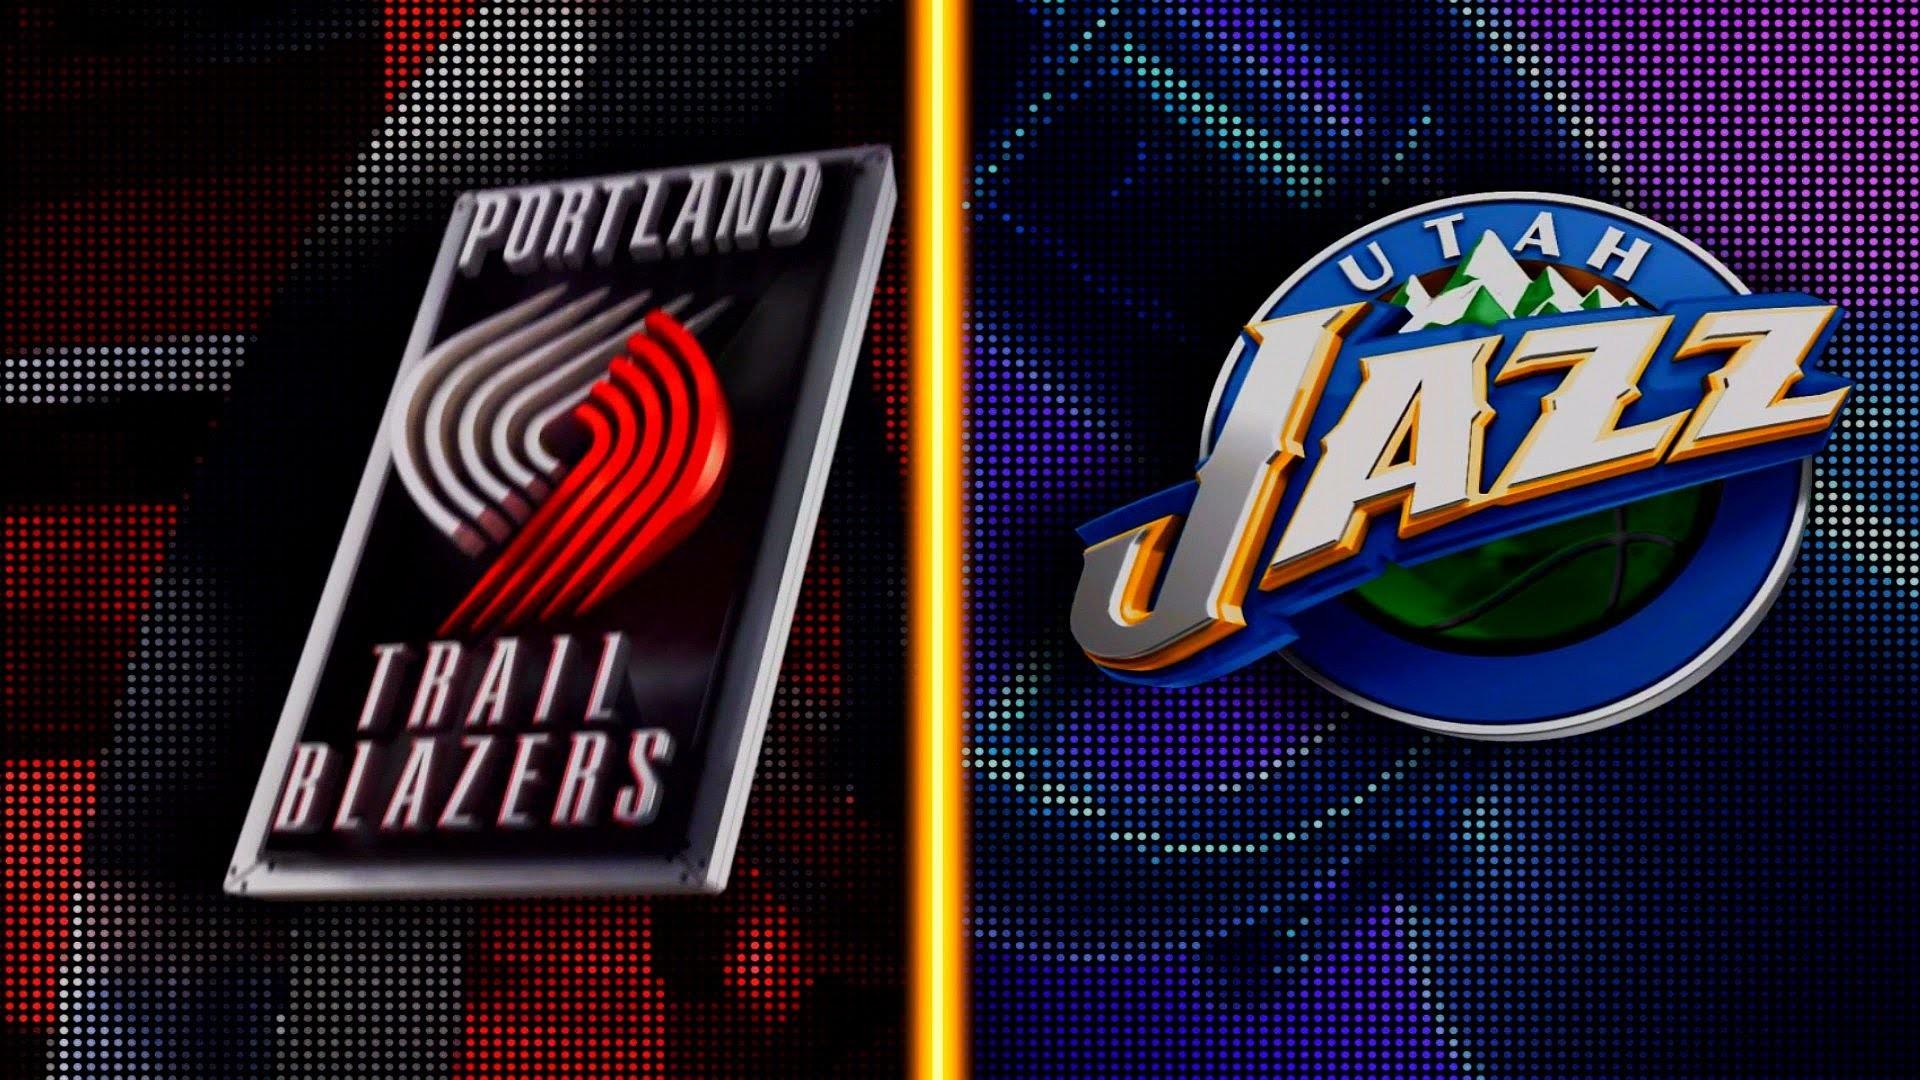 PS4: NBA 2K16 – Portland Trail Blazers vs. Utah Jazz [1080p 60 FPS] –  YouTube